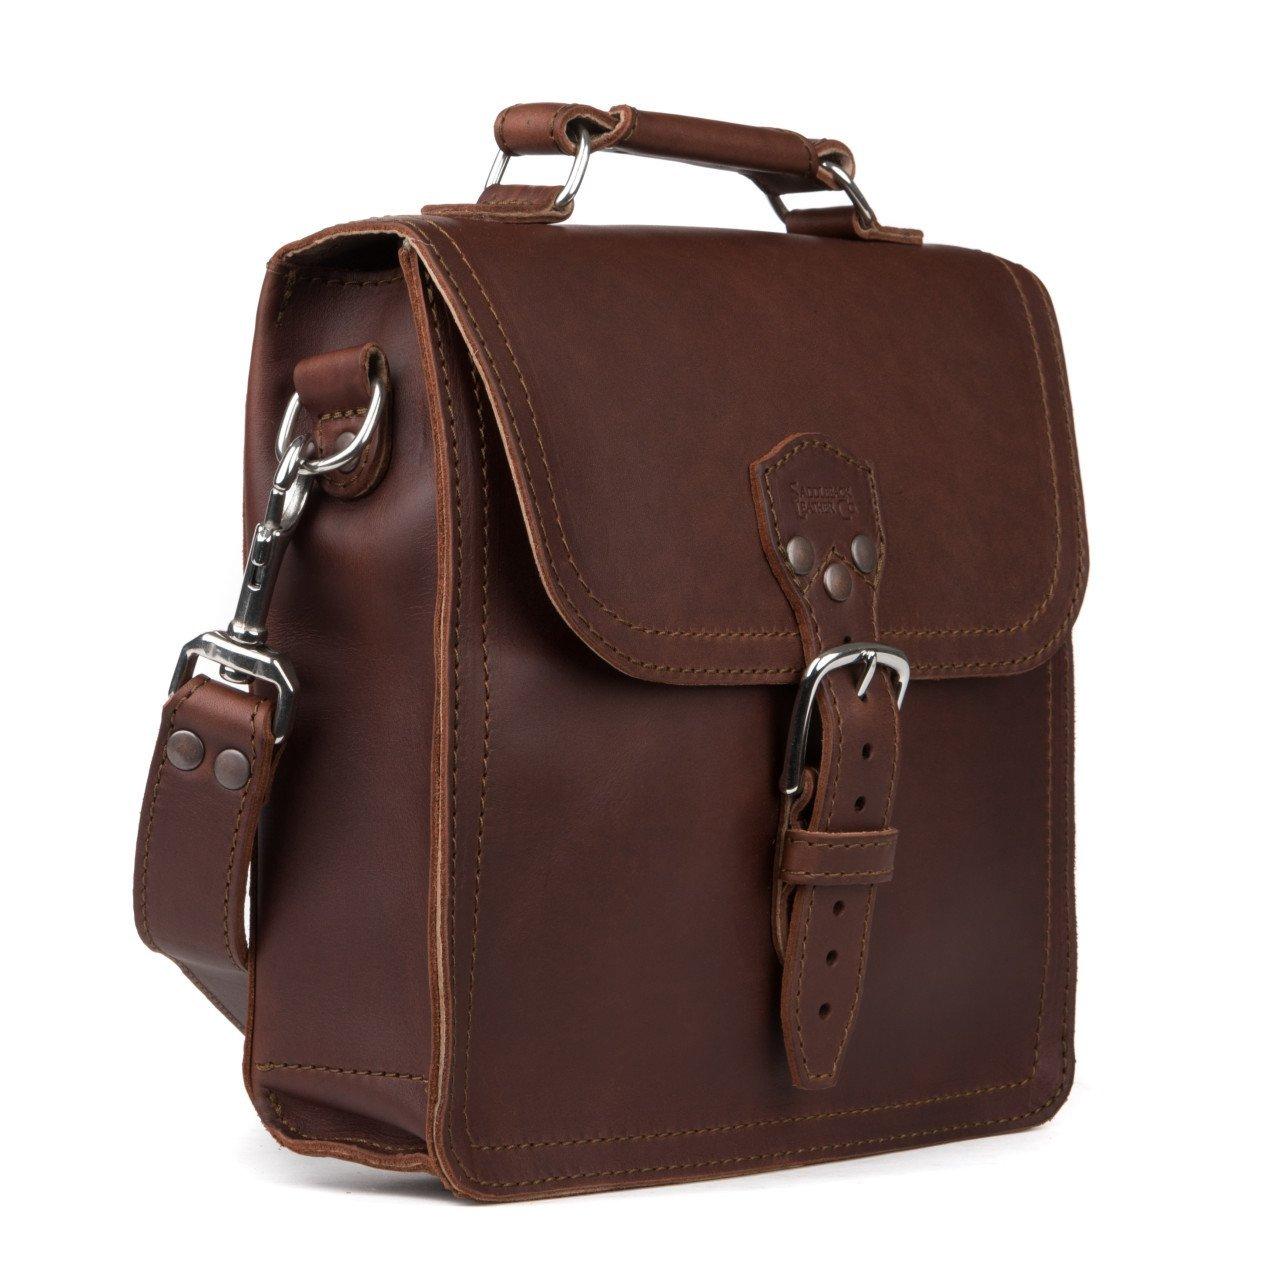 Saddleback Leather Co. Indiana Messenger Gear Bag Full Grain Leather Slim Satchel for Men Includes 100 Year Warranty.